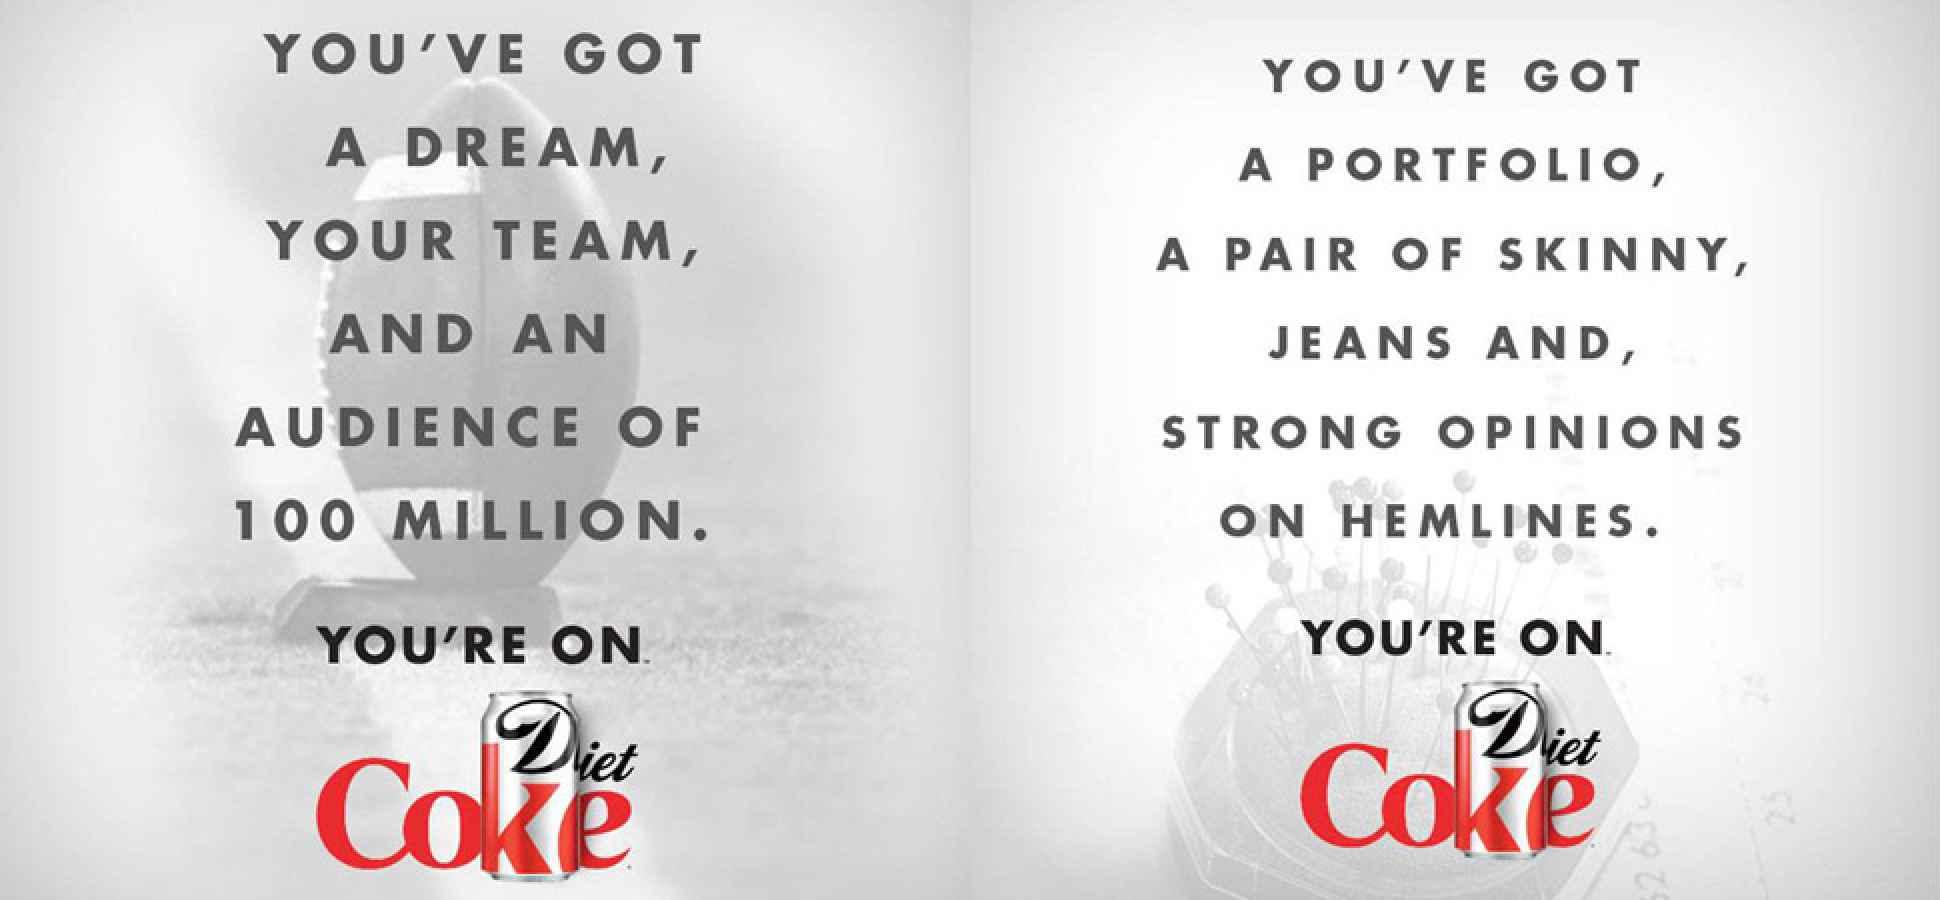 Diet Coke Ad Celebrates Entrepreneurs' Caffeine Addiction